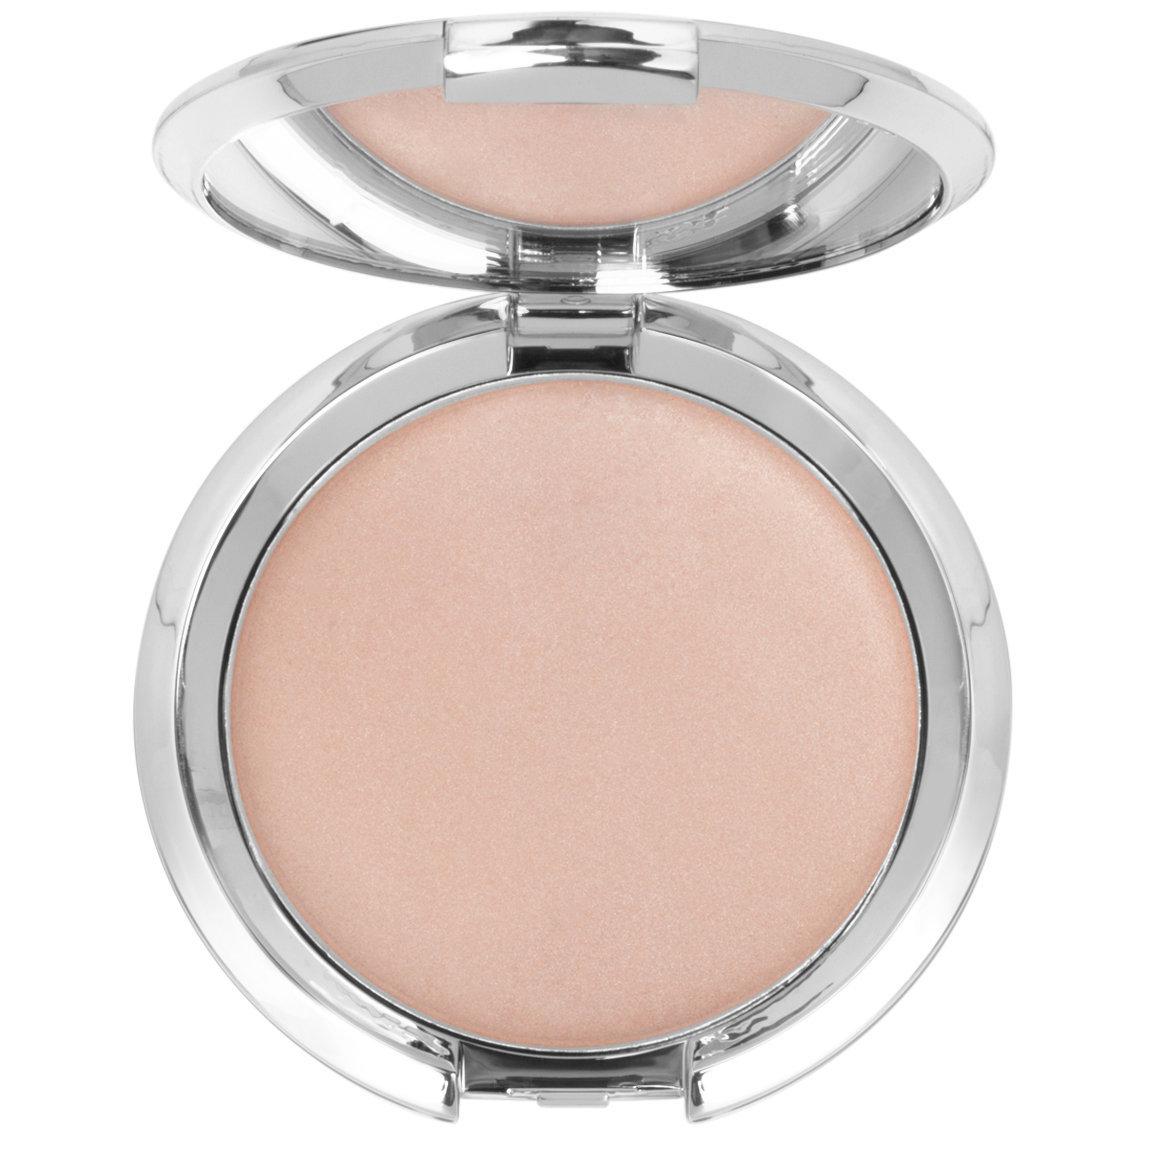 IT Cosmetics  Hello Light Anti-Aging Crème Illuminizer product swatch.